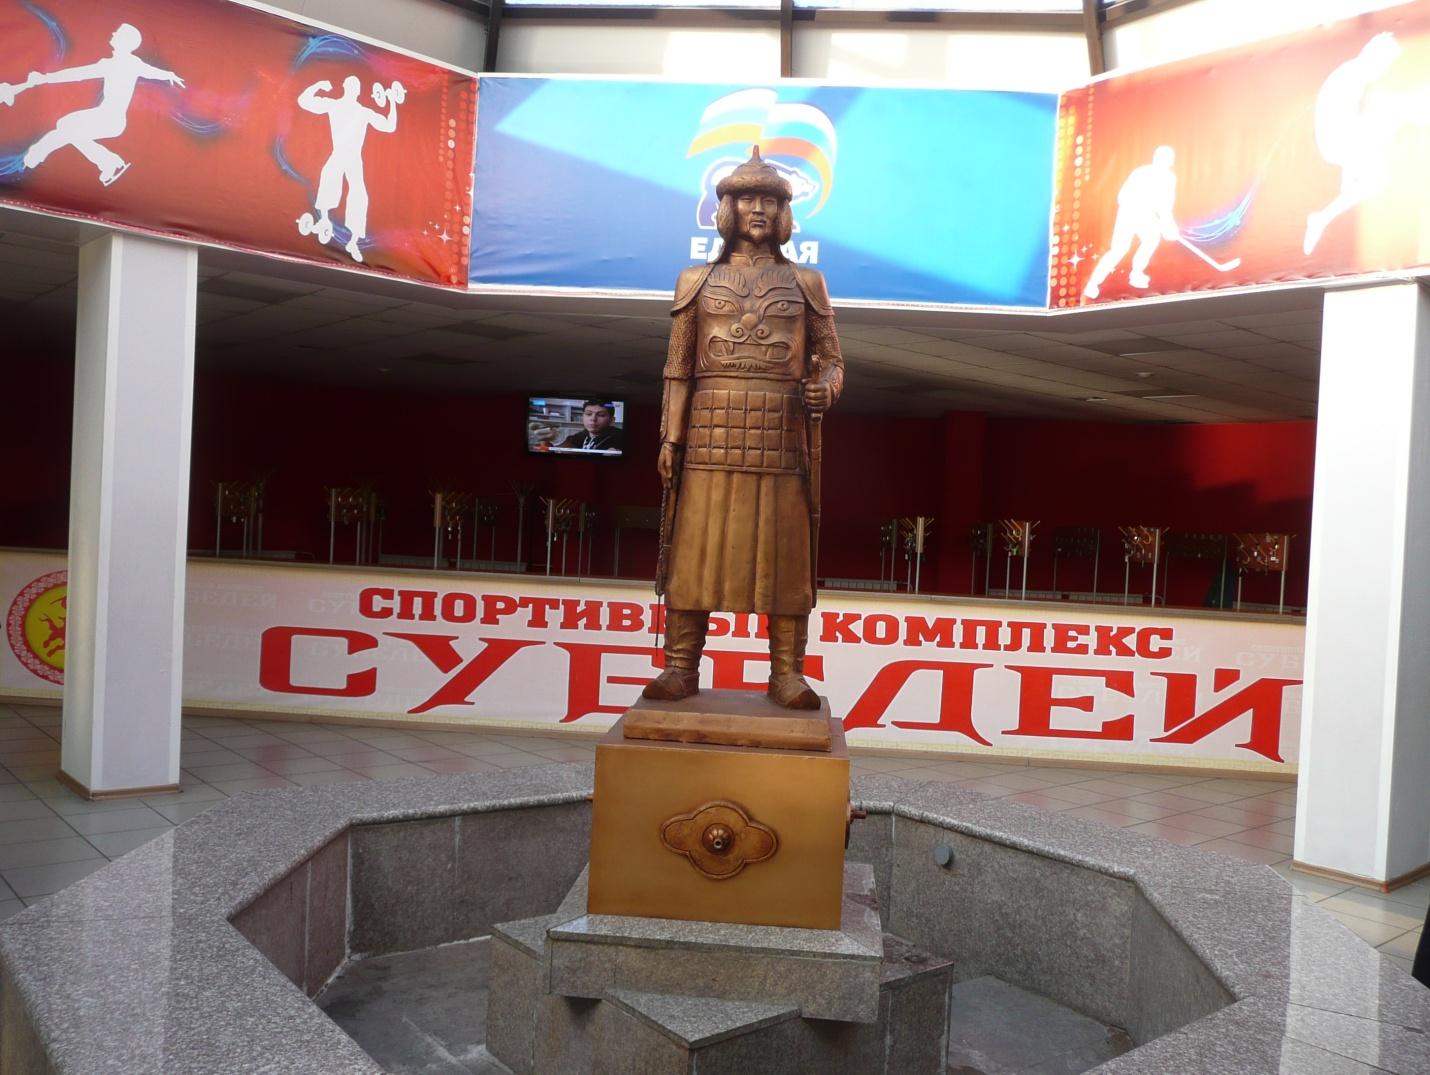 C:\Documents and Settings\Admin\Рабочий стол\Кызыл\DCIM\125_PANA\P1250065.JPG